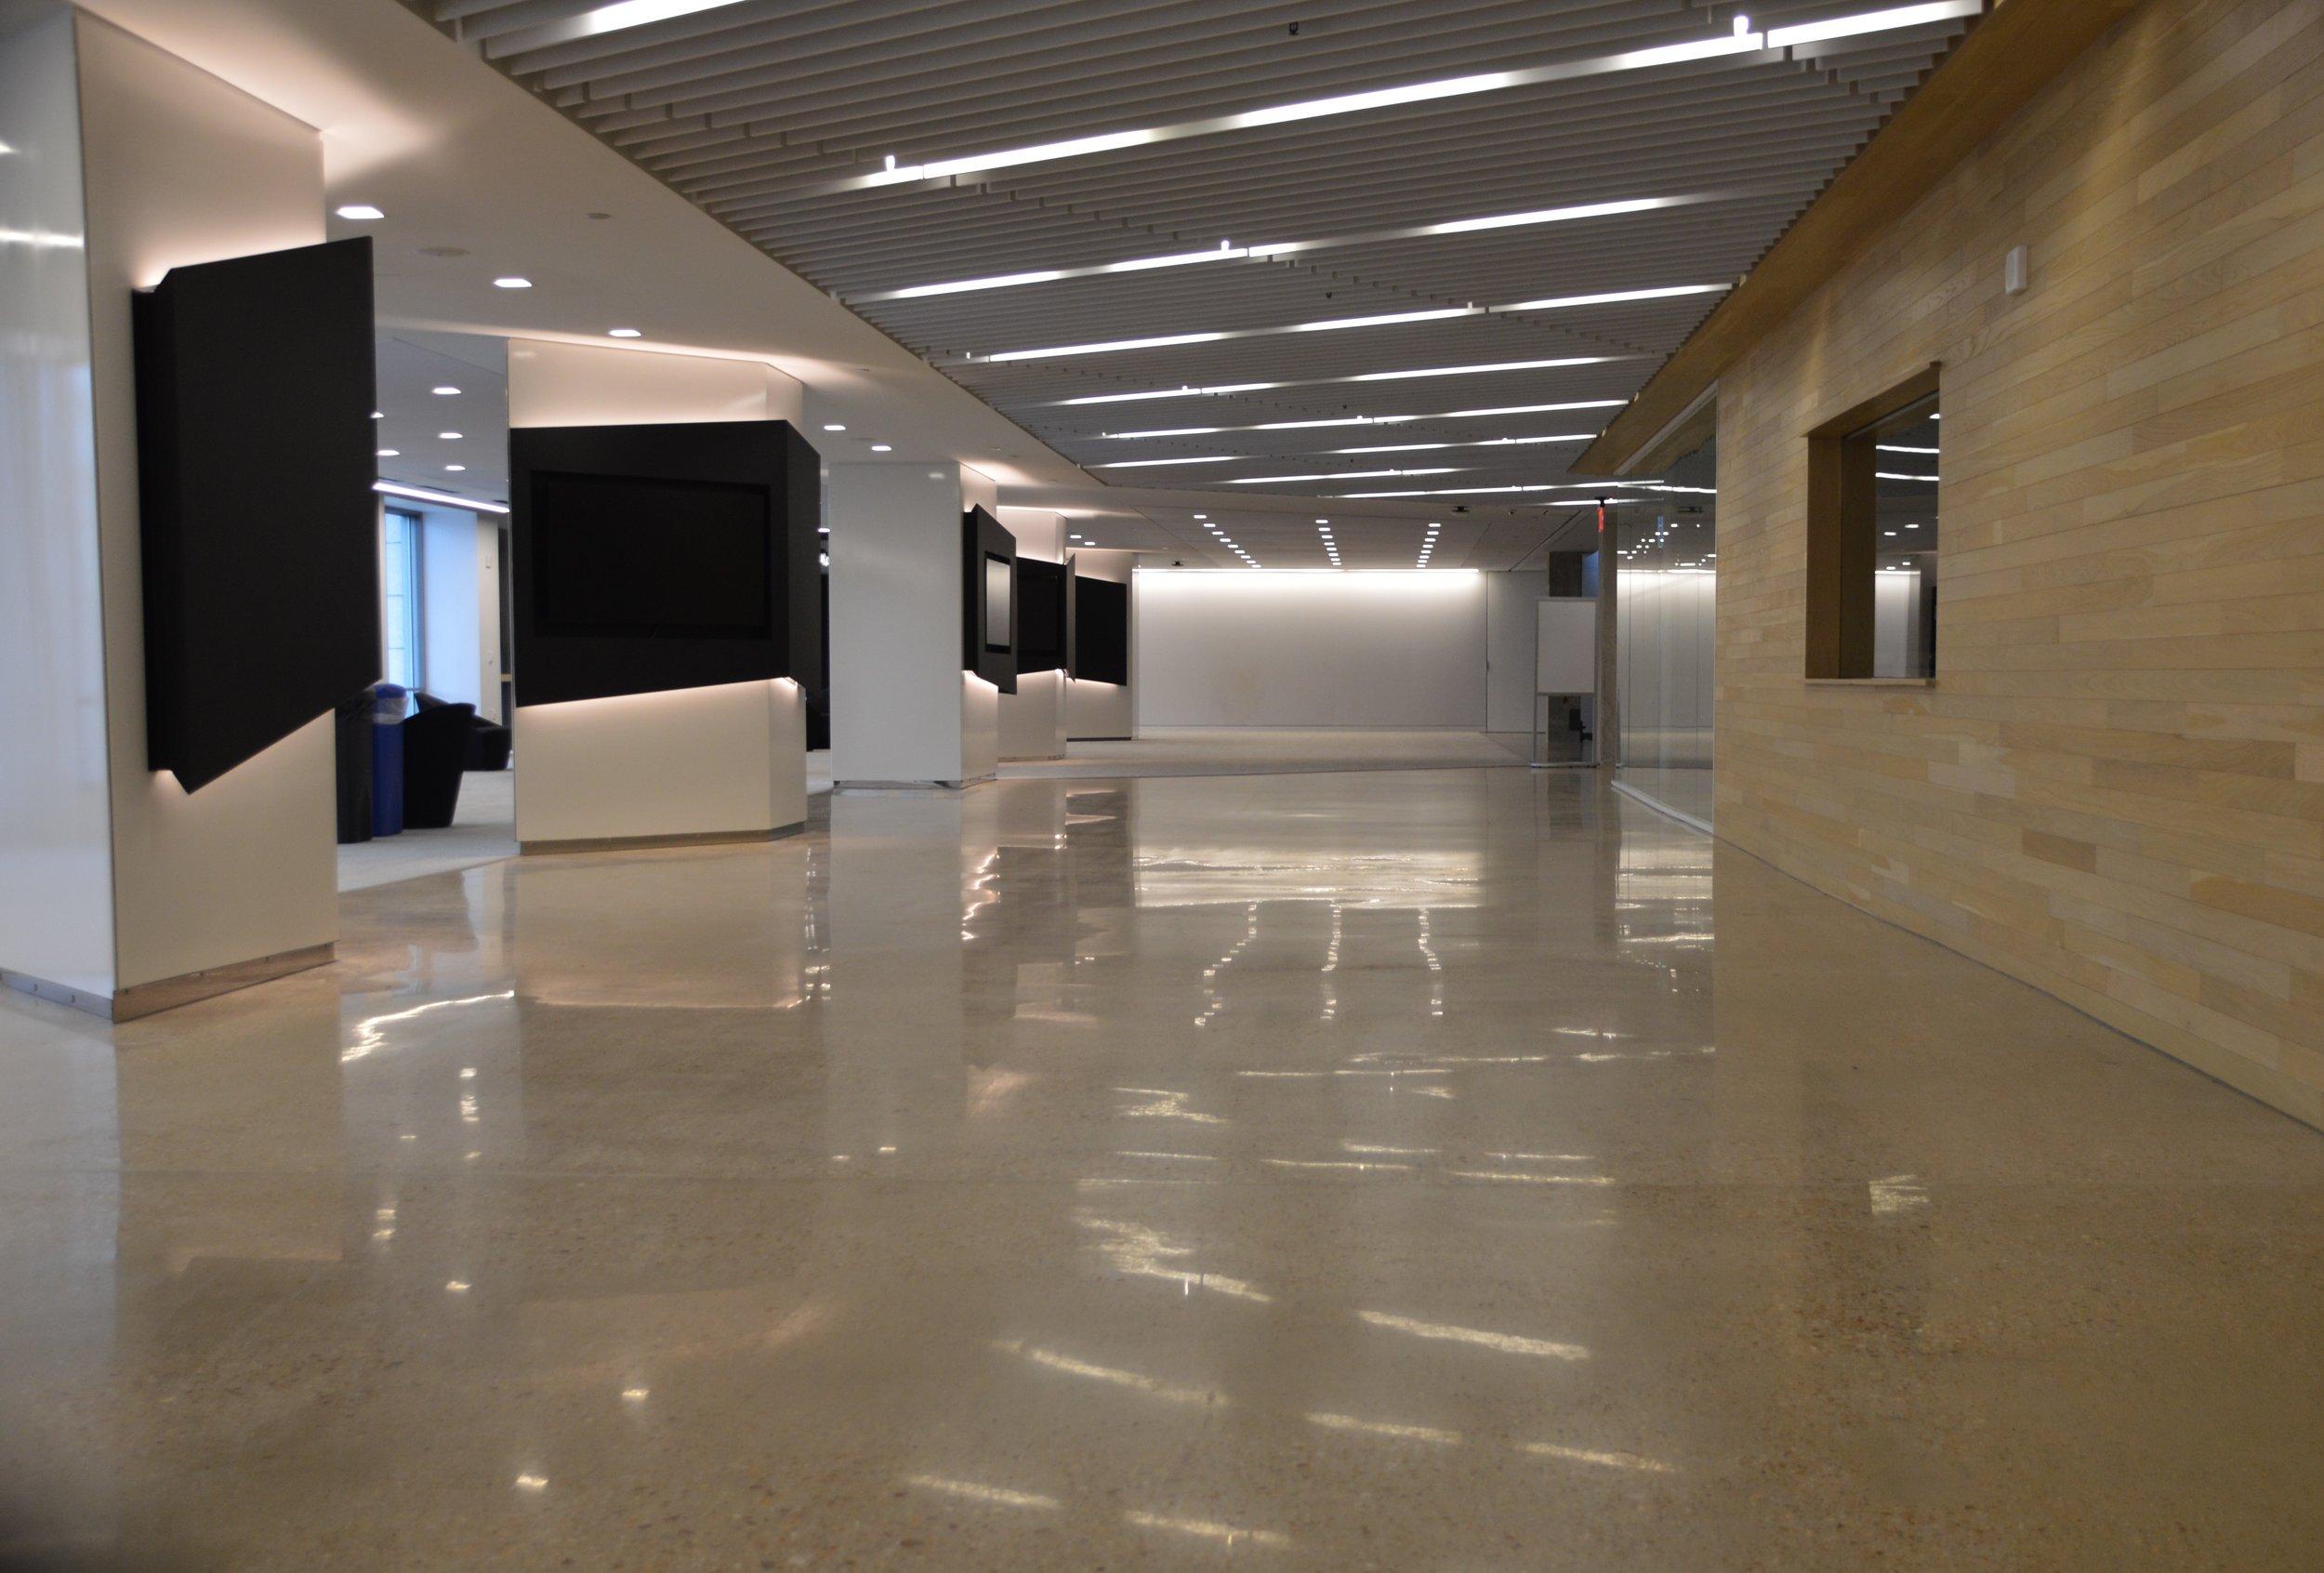 washington post hq - Polished Concrete